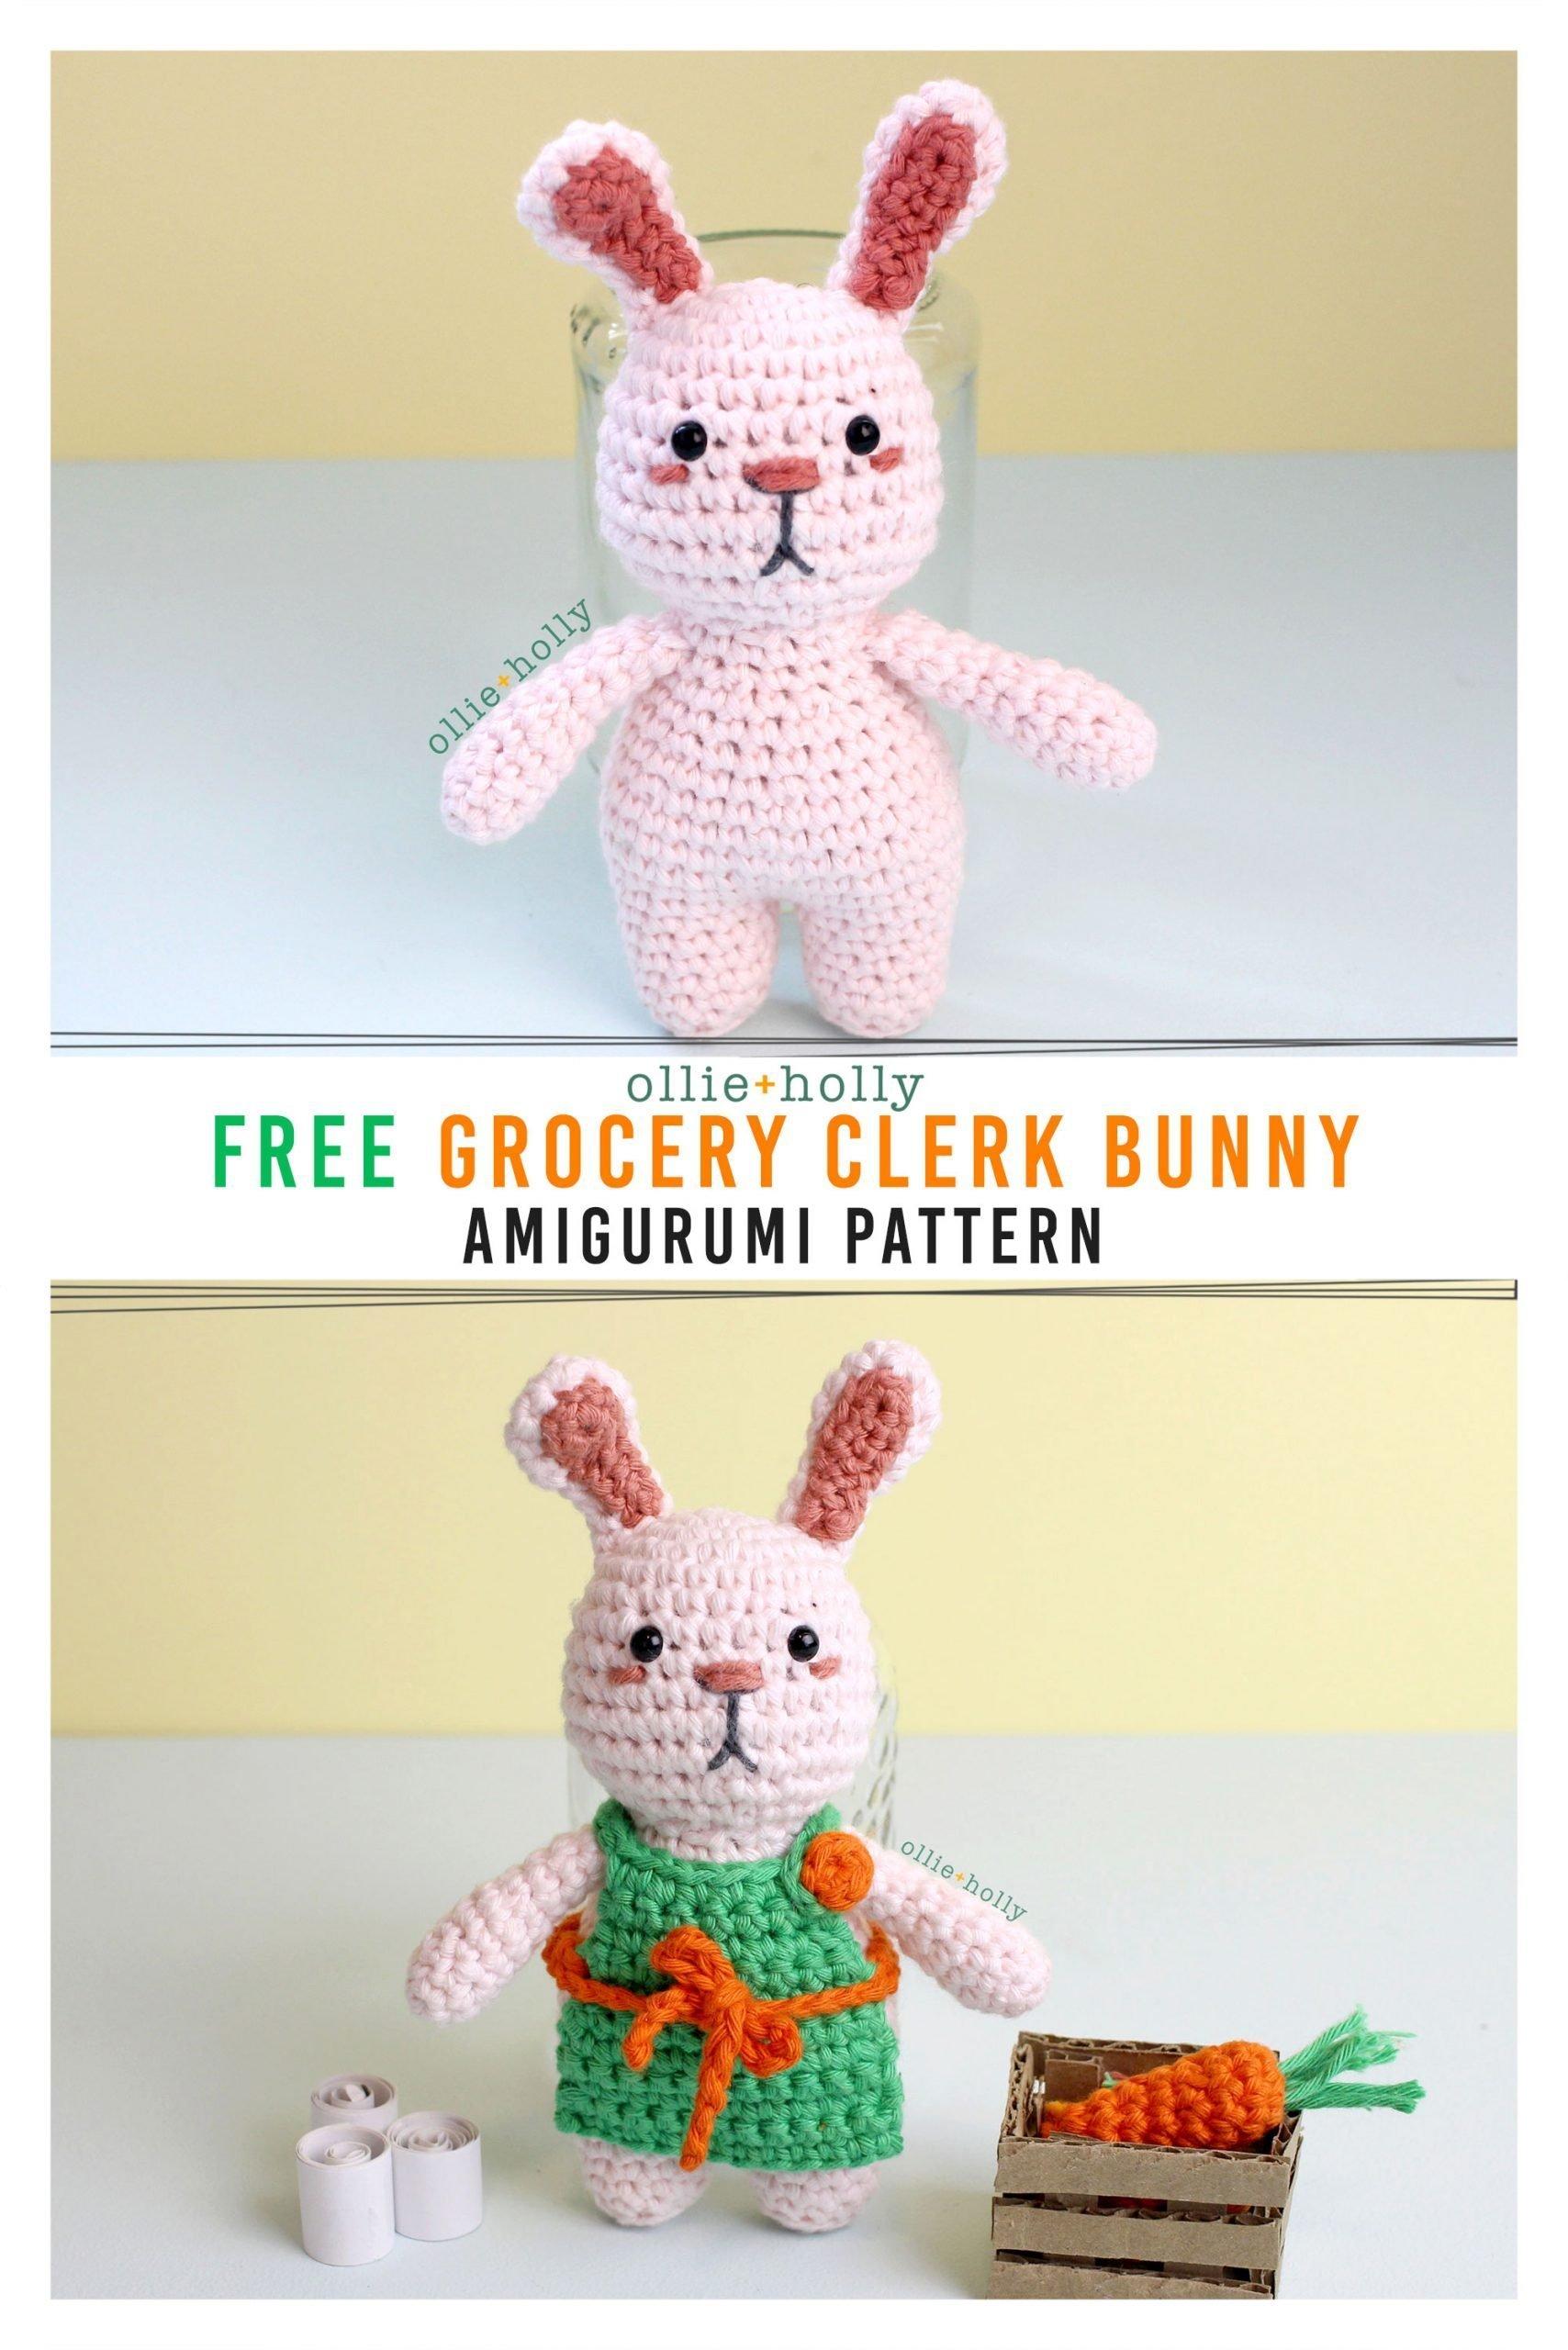 Free Grocery Clerk Bunny Stuffed Animal Amigurumi Crochet Pattern